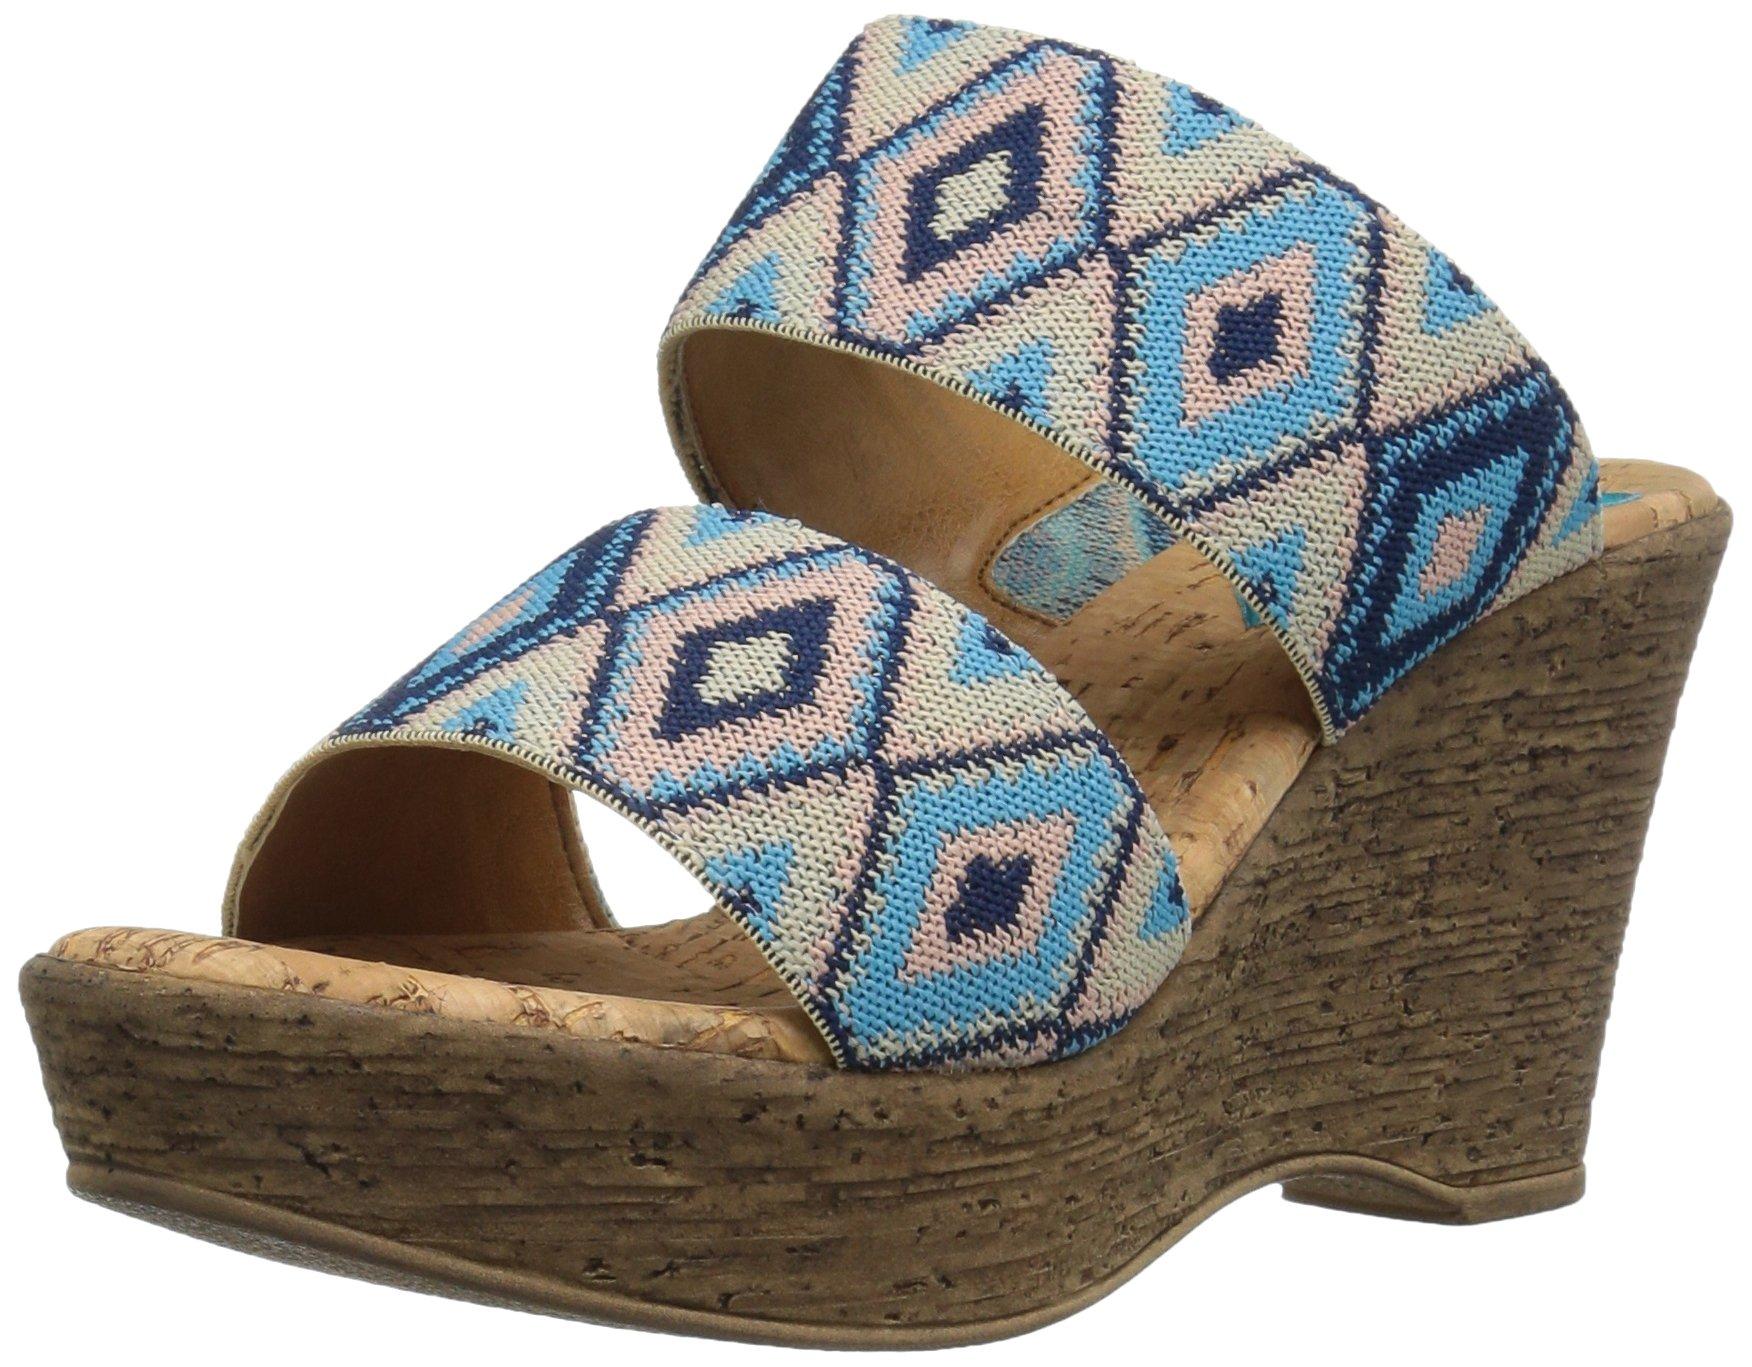 Love & Liberty Women's Sasha-LL Wedge Sandal, Blue, 6 M US